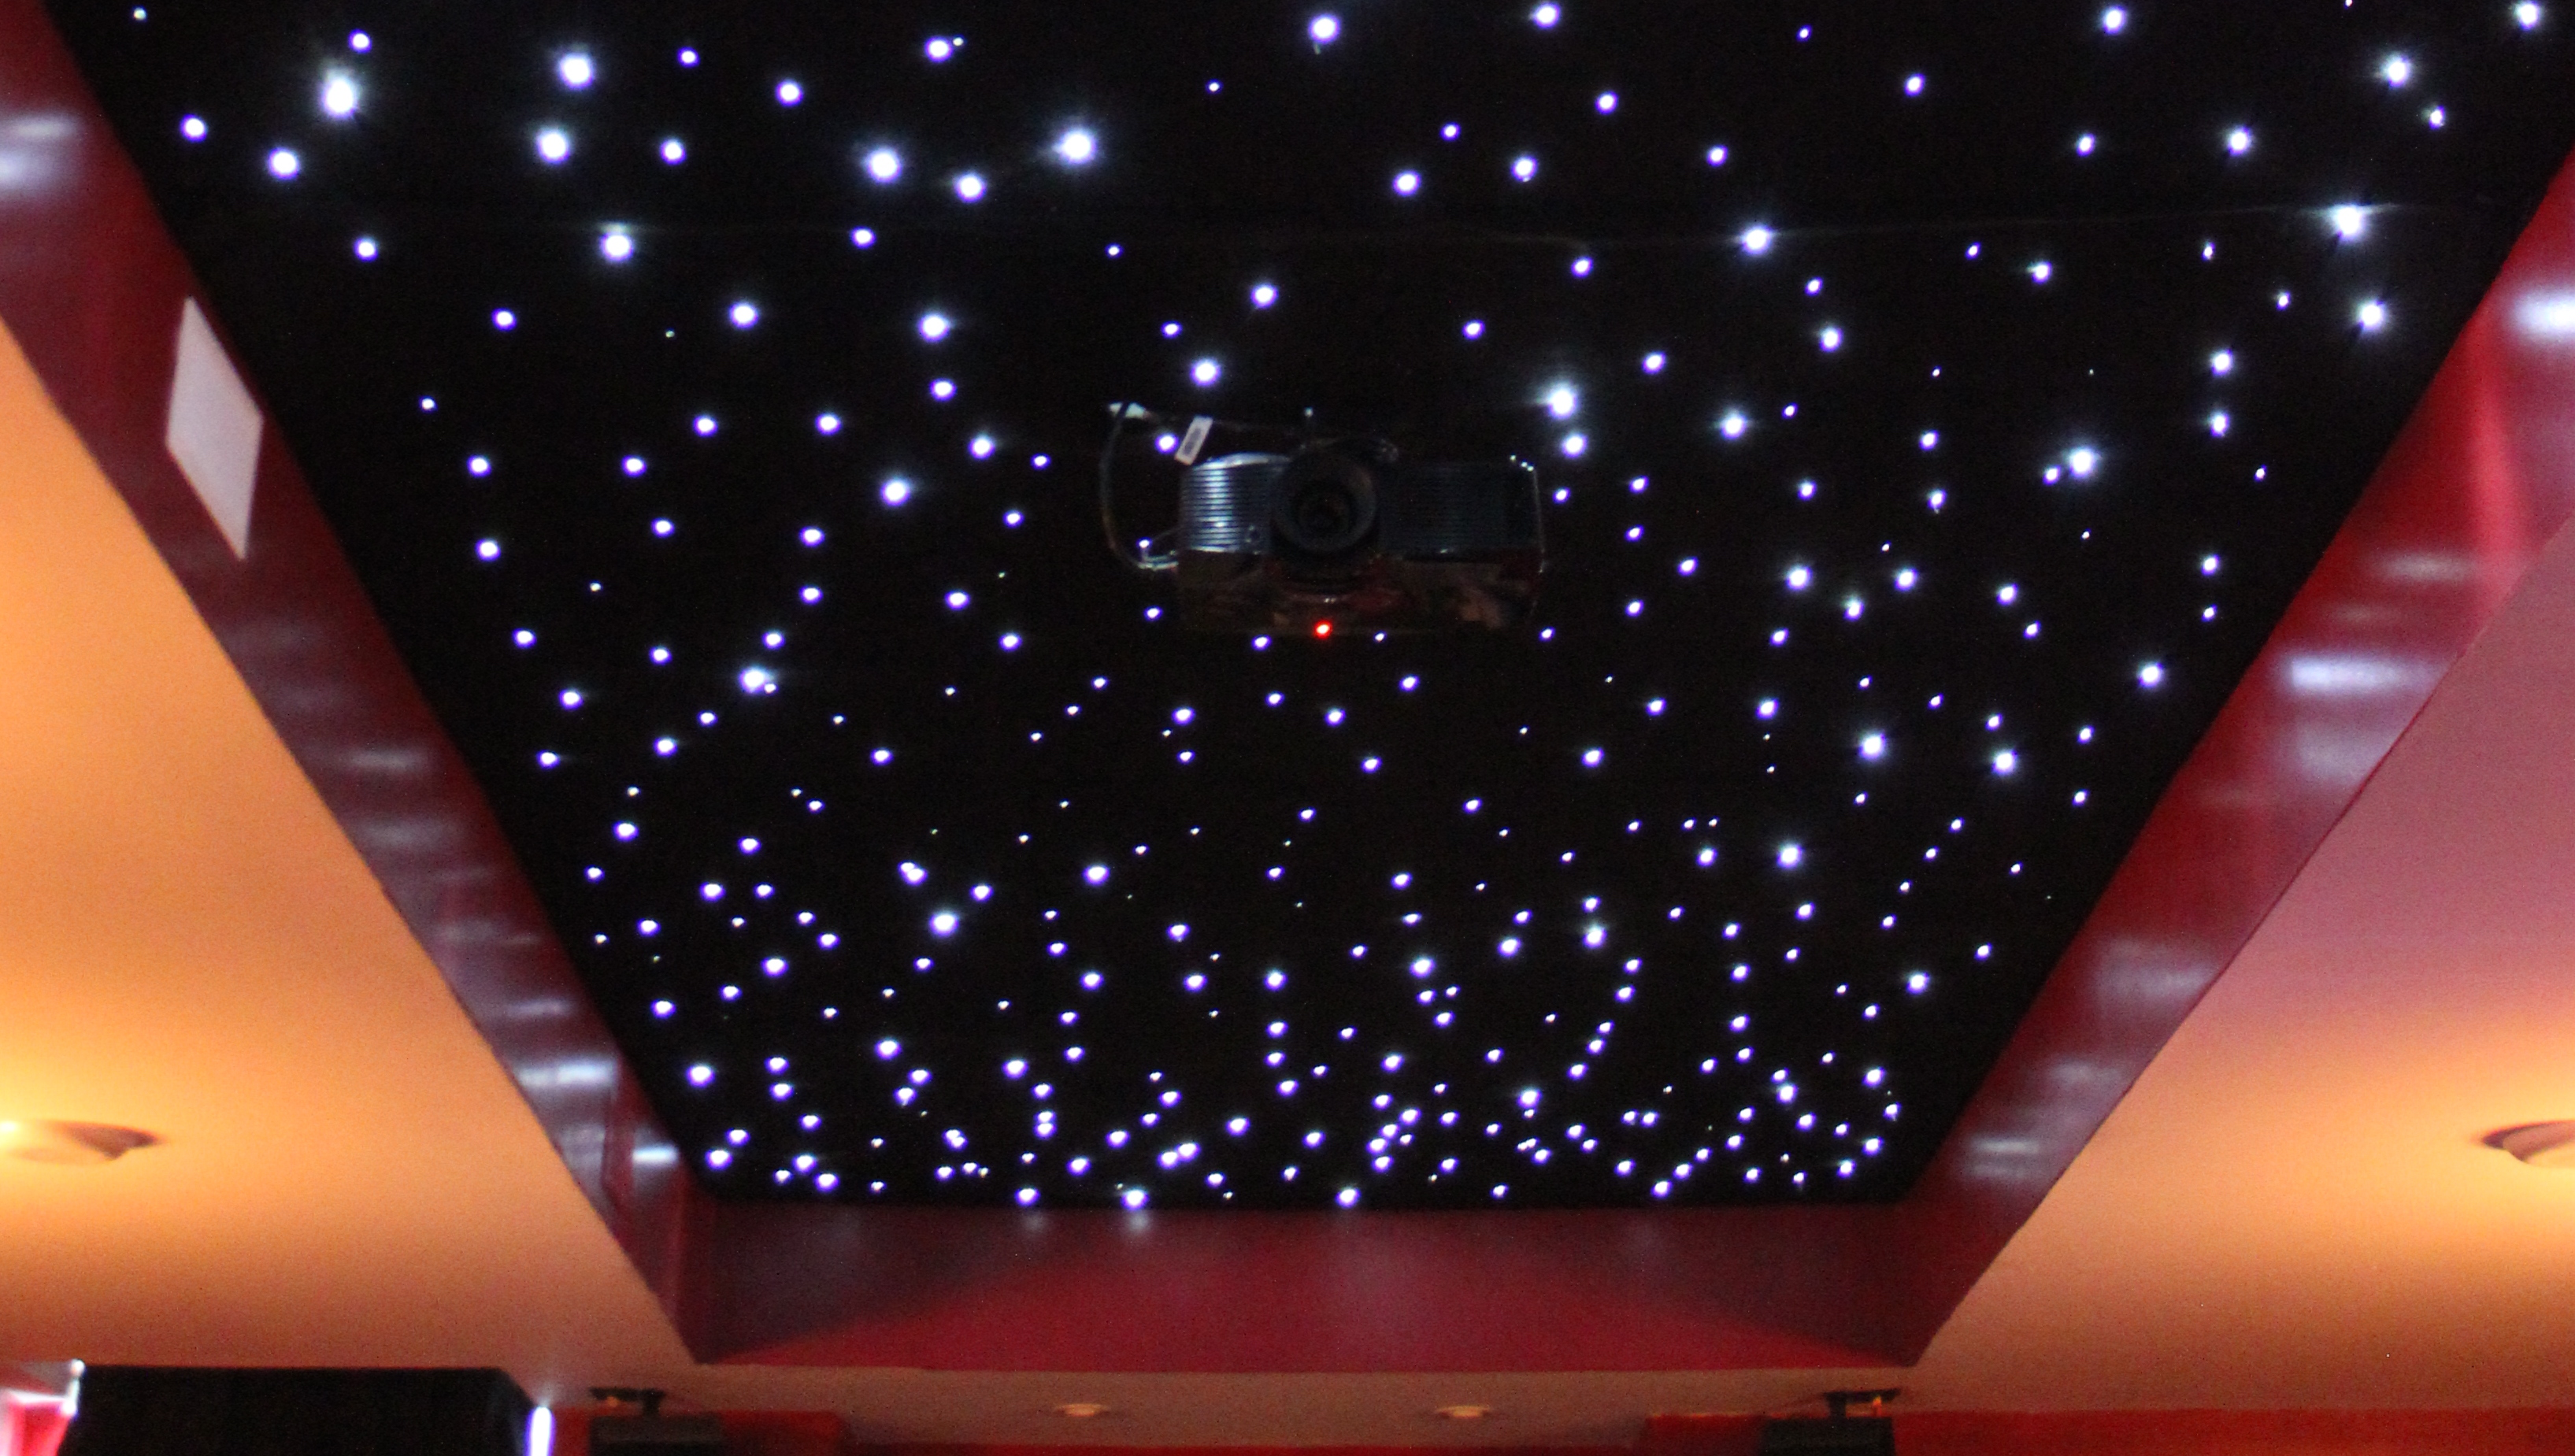 installing a fiber optic starfield ceiling make. Black Bedroom Furniture Sets. Home Design Ideas